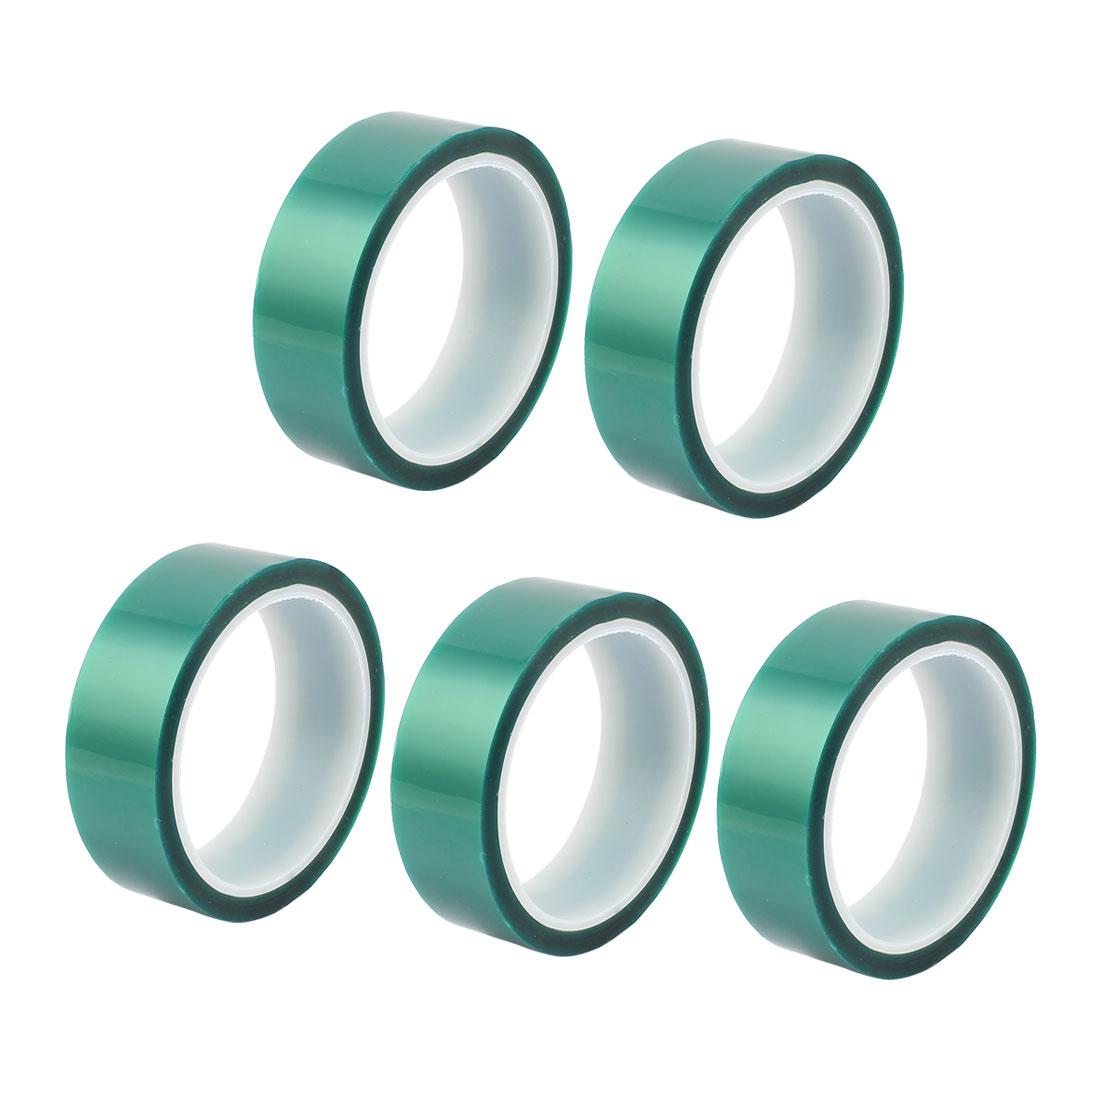 5pcs 30mm Width 33M Long Green PET High Temperature Heat Resistant PCB Solder Tape